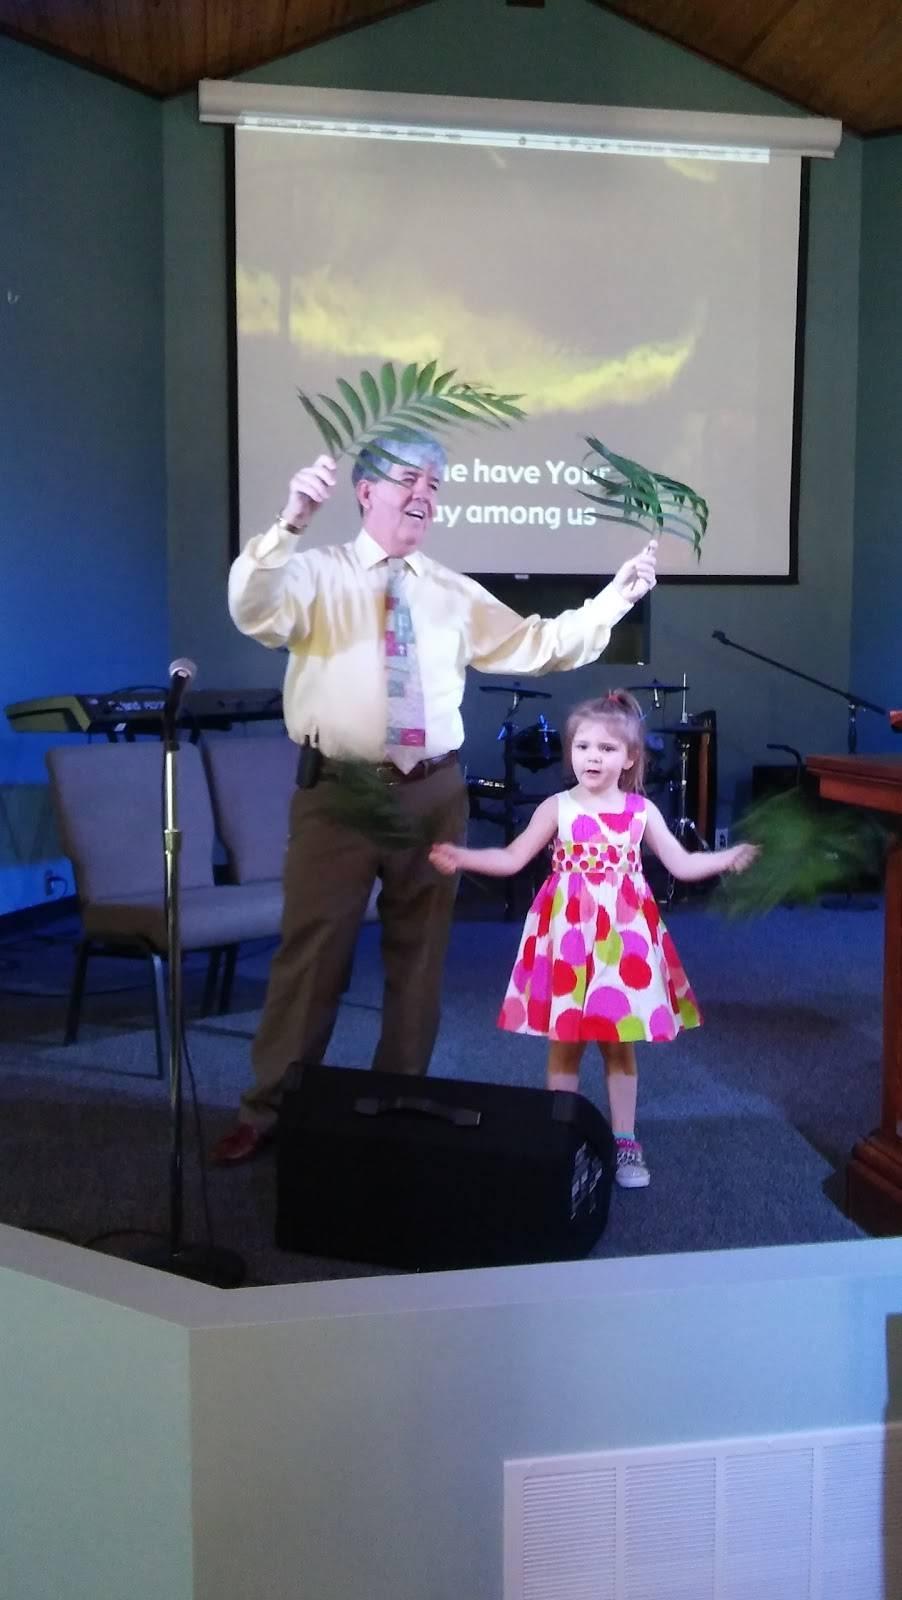 Cedar View General Baptist Church - church  | Photo 1 of 9 | Address: 3716 Ruth Dr, Granite City, IL 62040, USA | Phone: (618) 931-5330